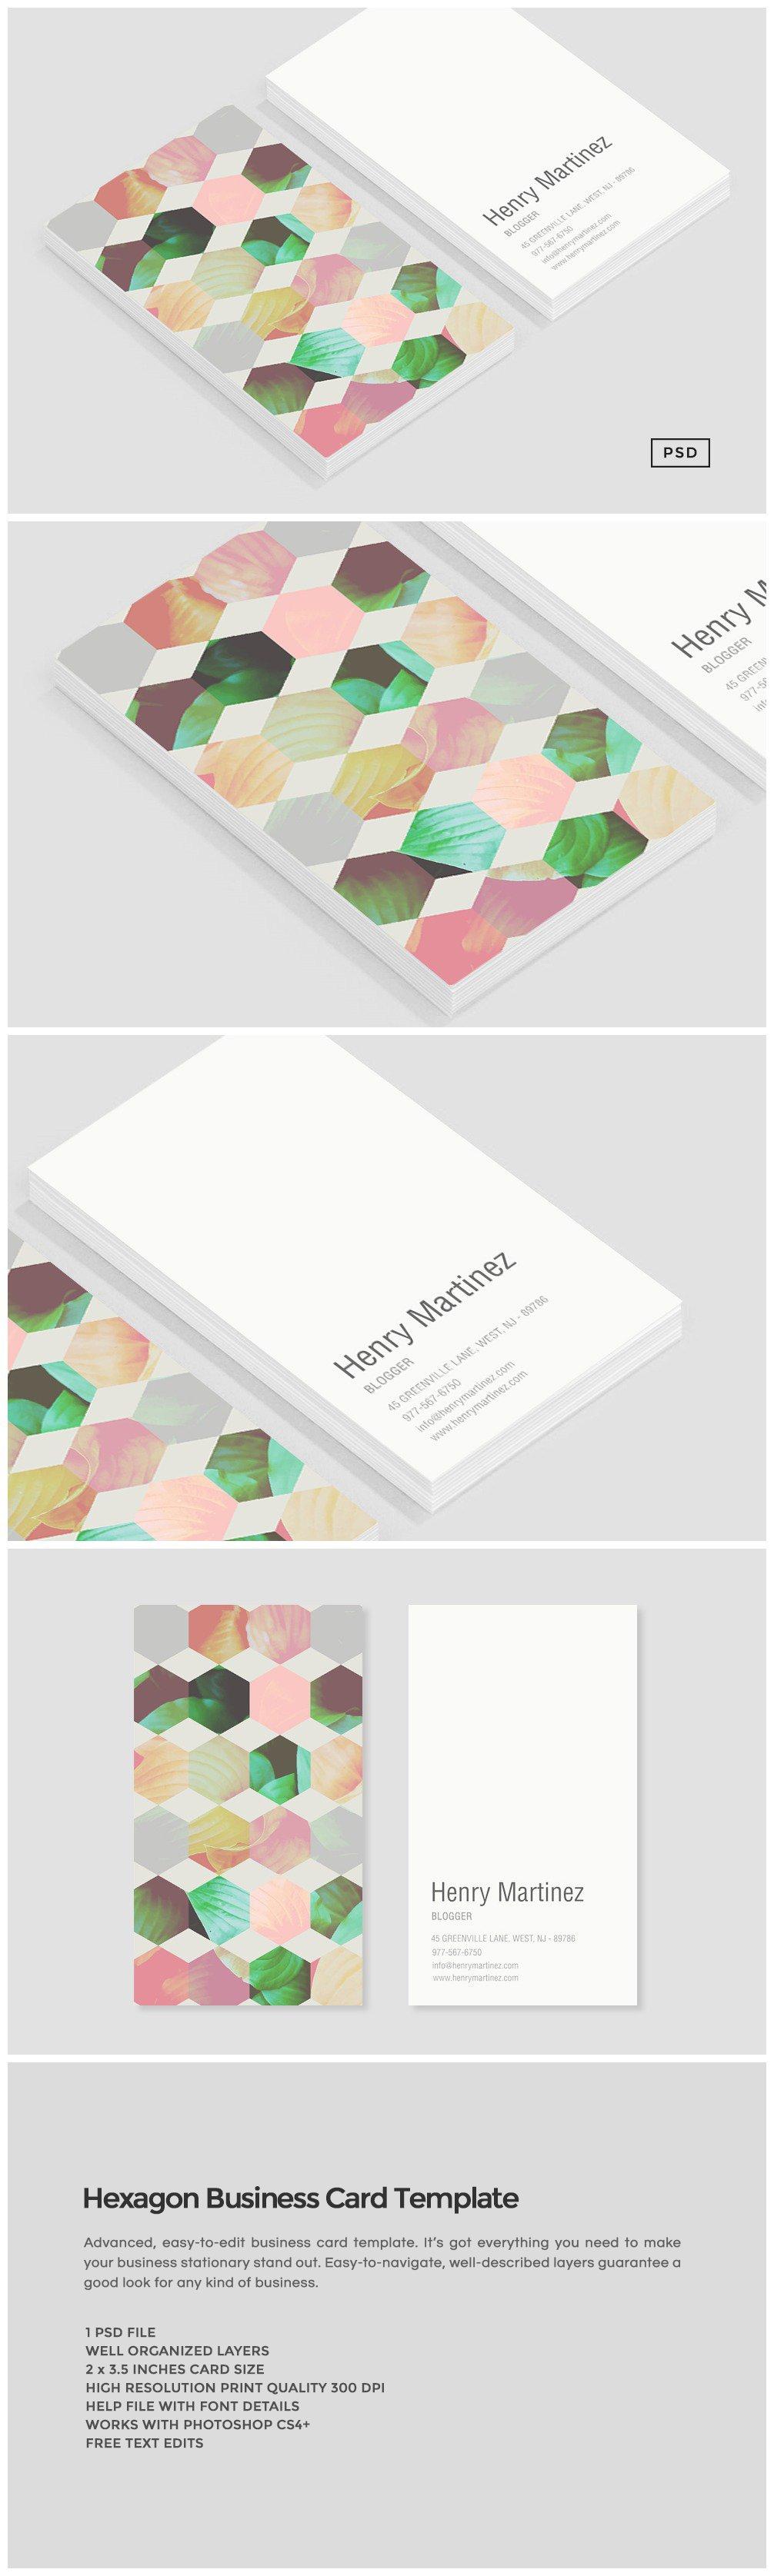 Hexagon Business Card Template ~ Business Card Templates ~ Creative ...